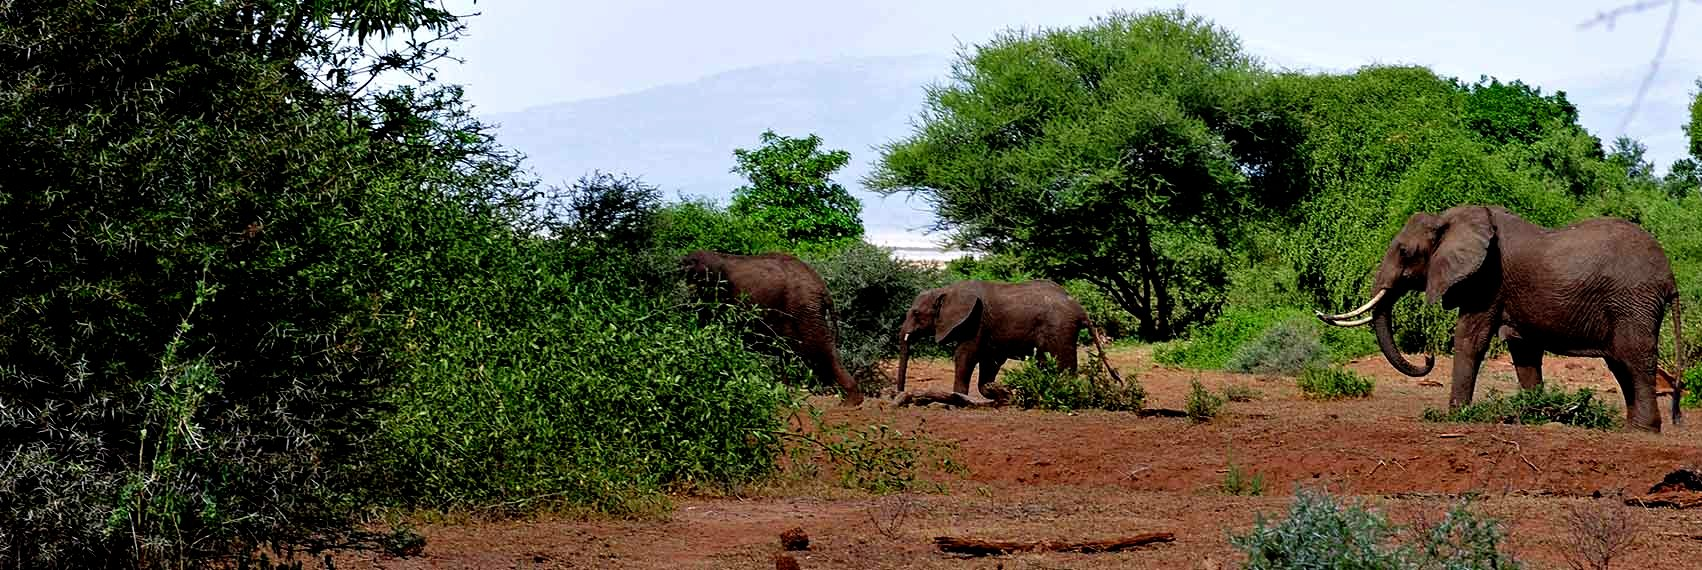 Arusha National Park Walking Tour